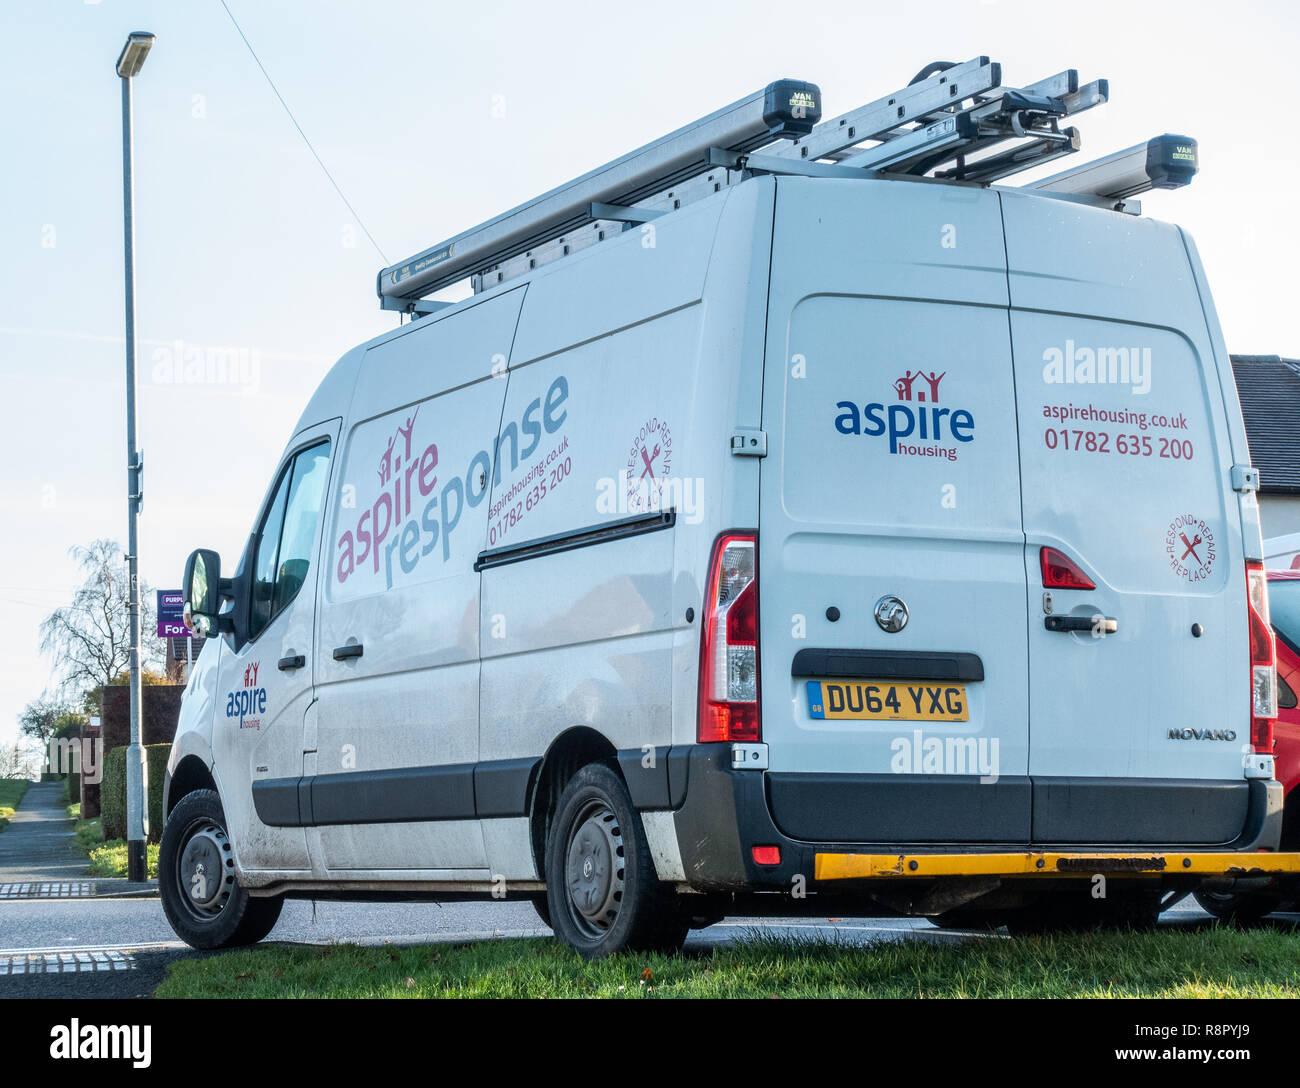 An Aspire Maintenance Vehicle servicing social housing - Stock Image